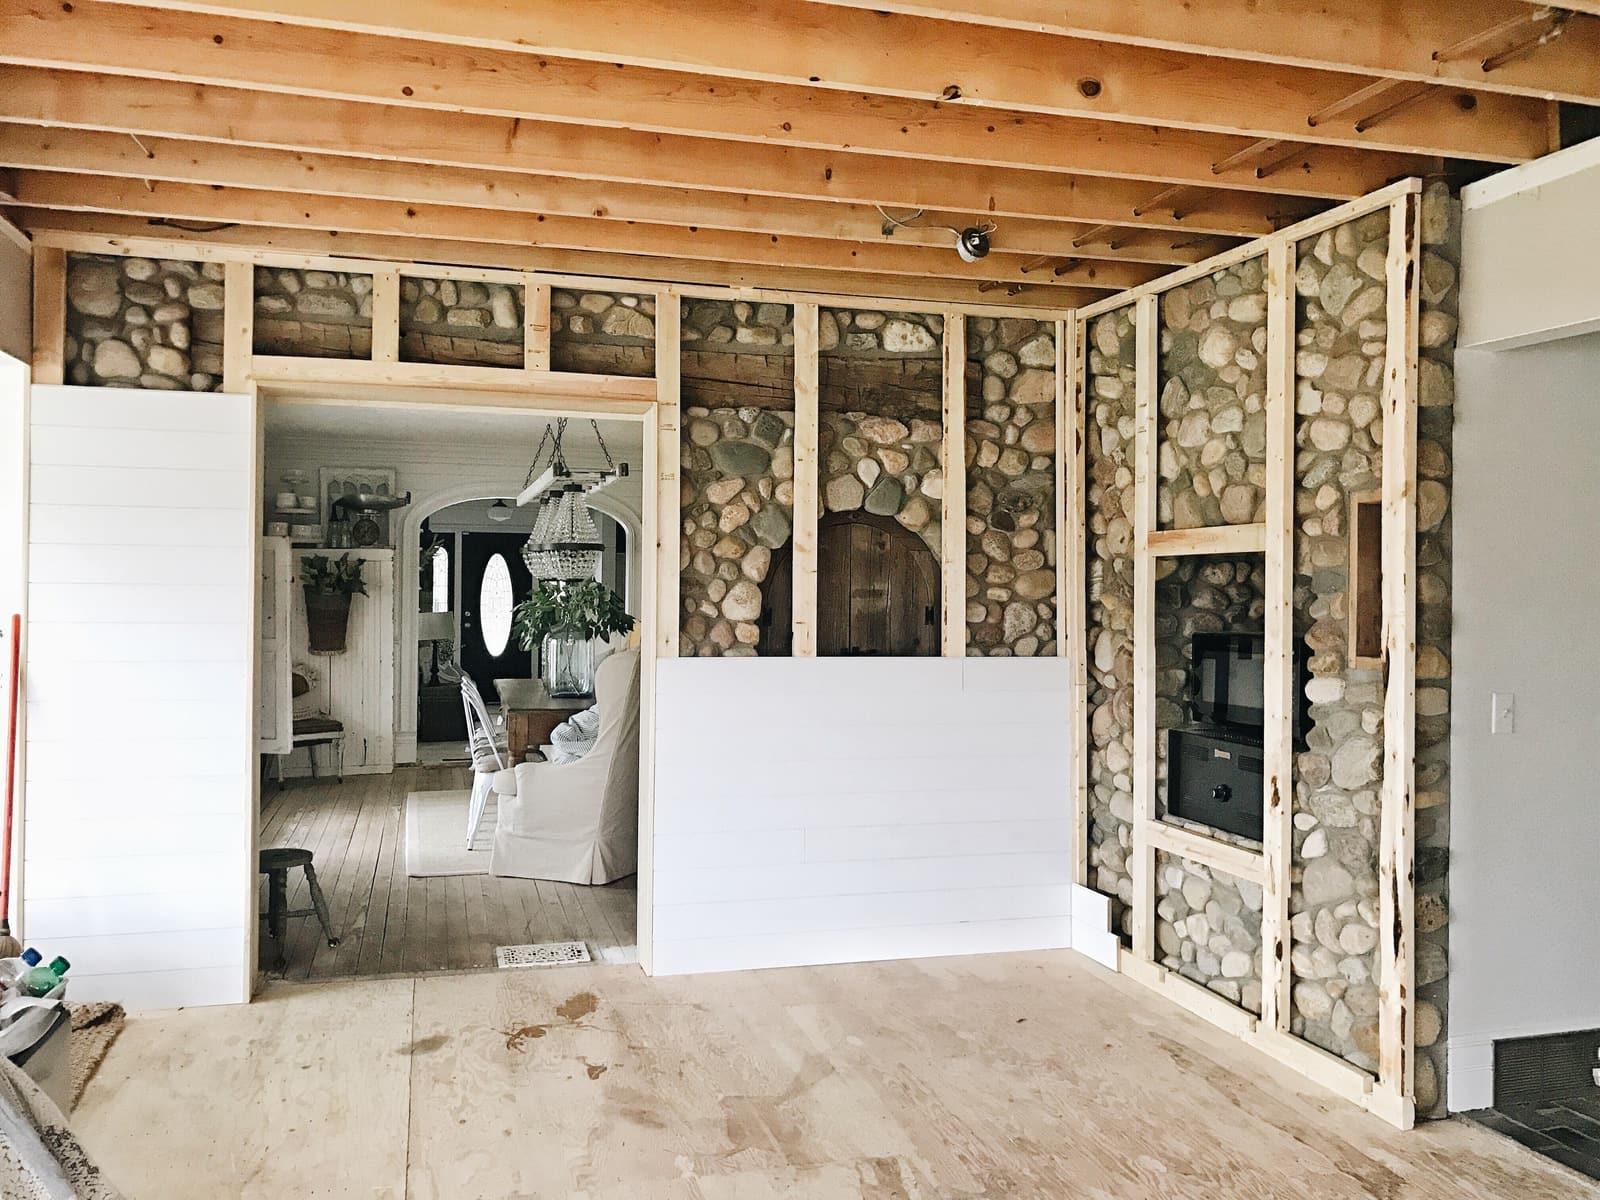 Kitchen Renovation Shiplap Wall Complete